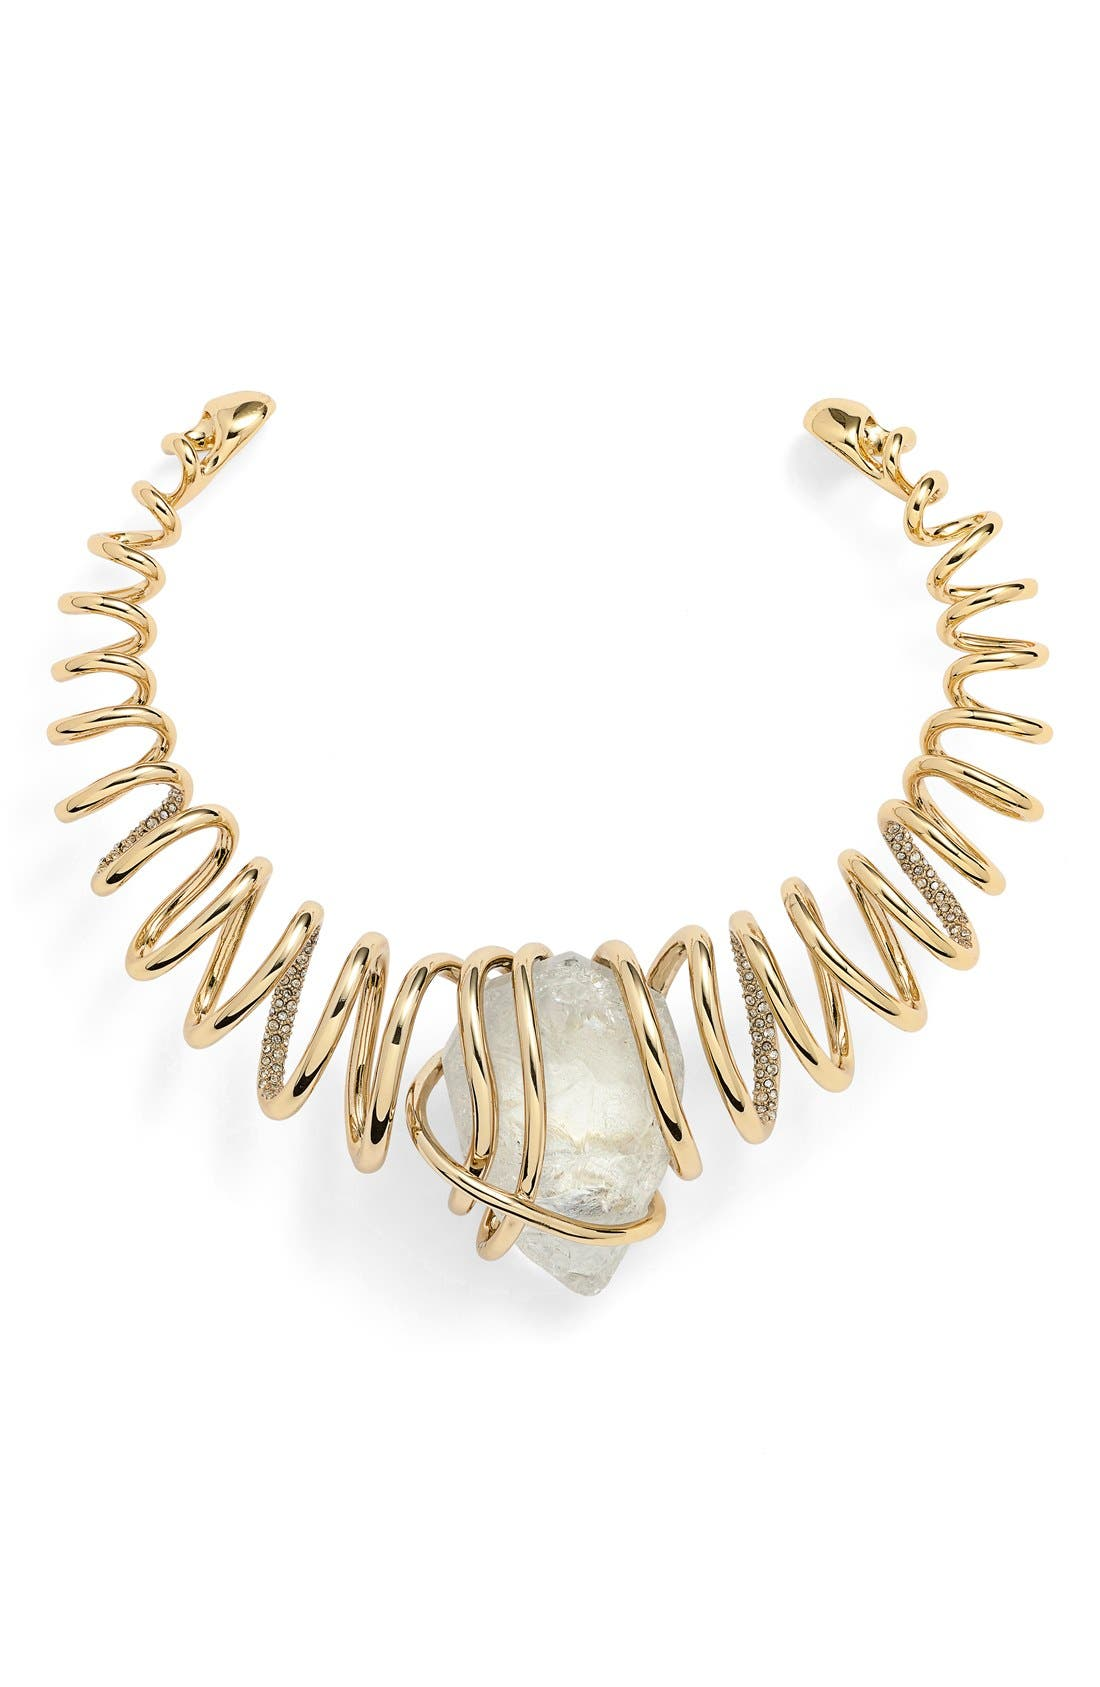 Alternate Image 1 Selected - Alexis Bittar 'Miss Havisham' Encrusted Spiral Collar Necklace